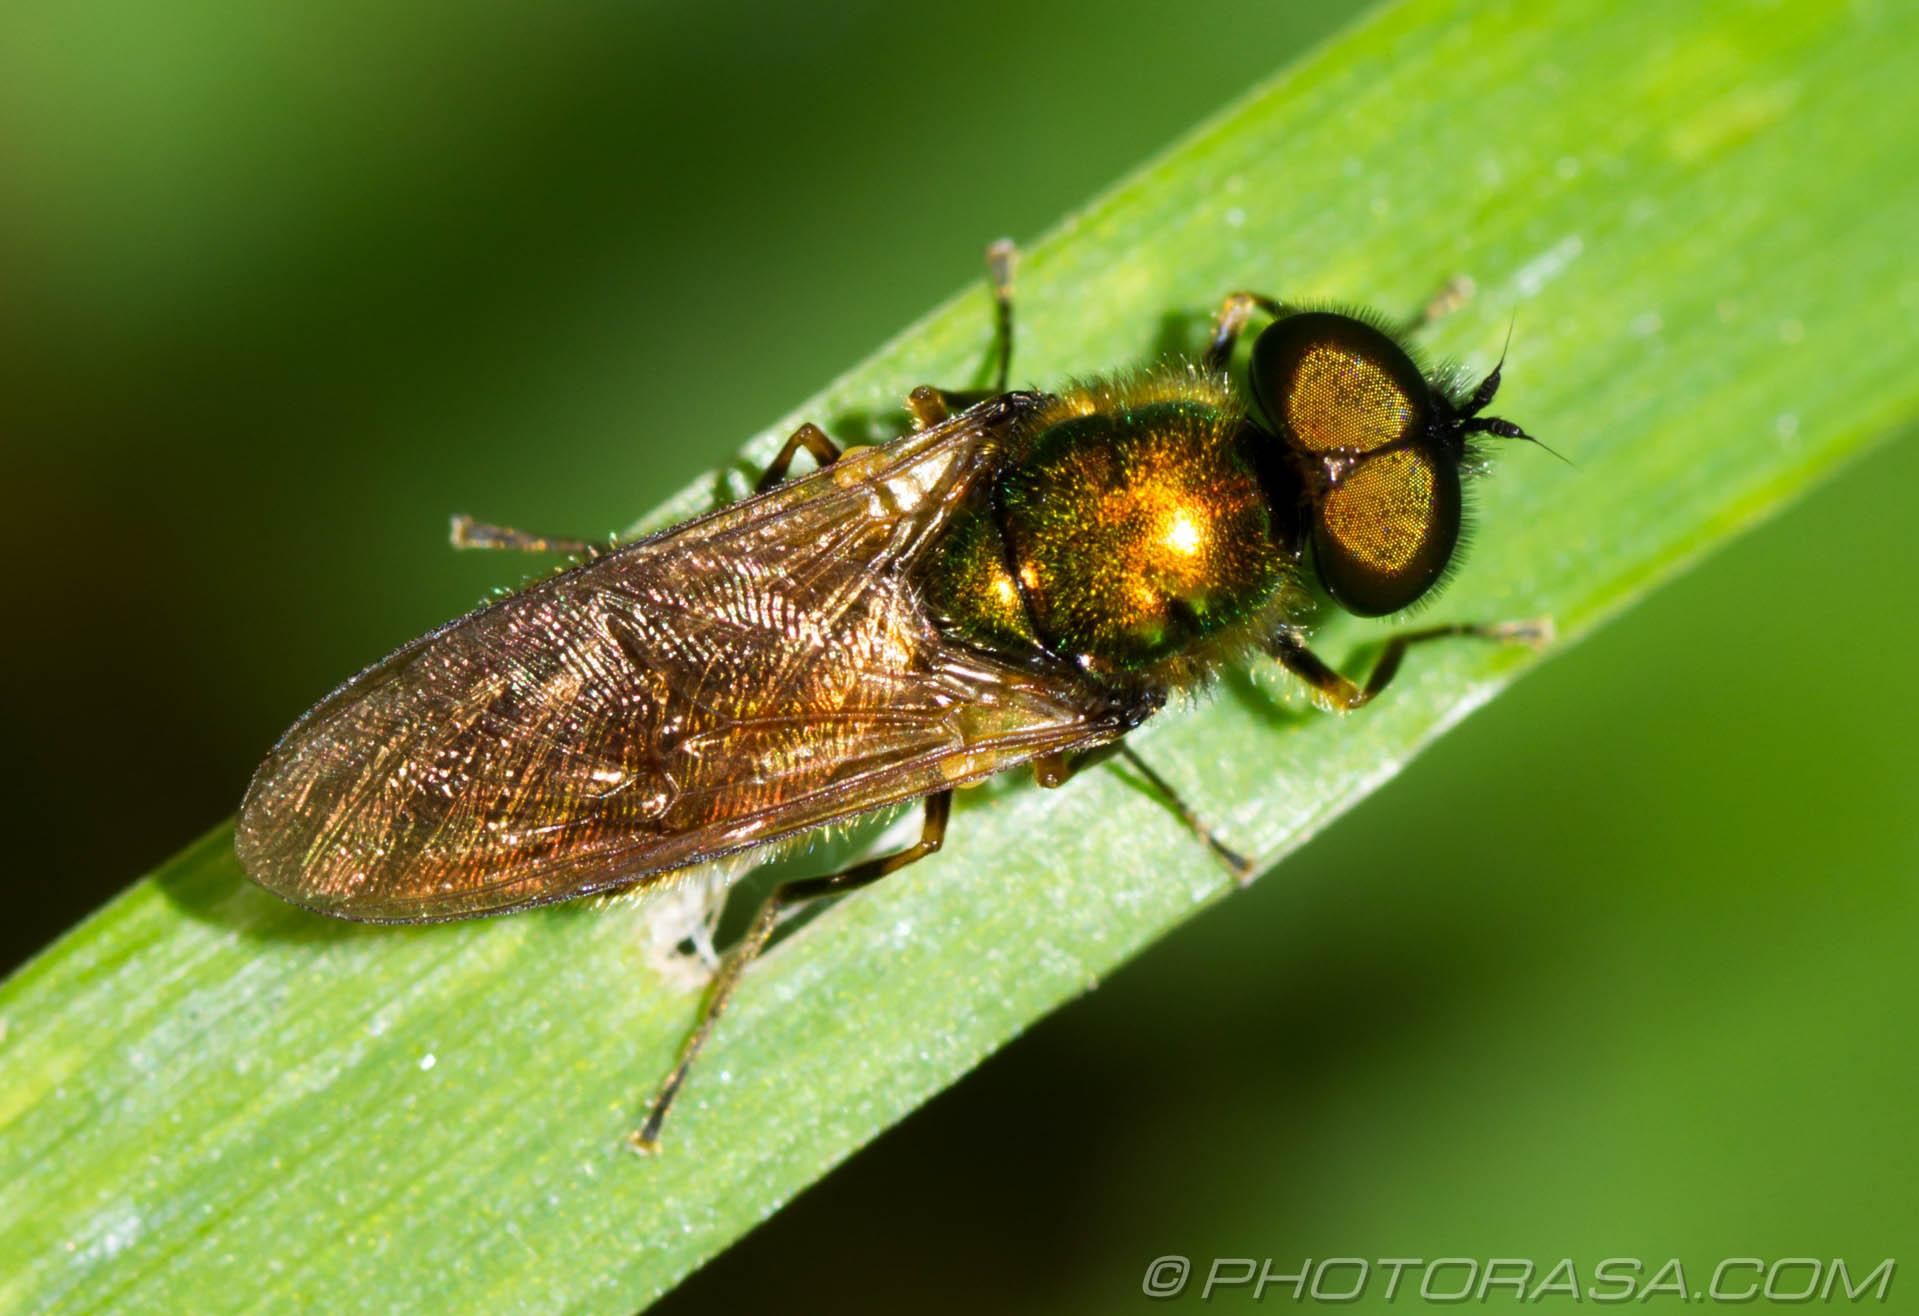 https://photorasa.com/golden-fly/golden-fly/